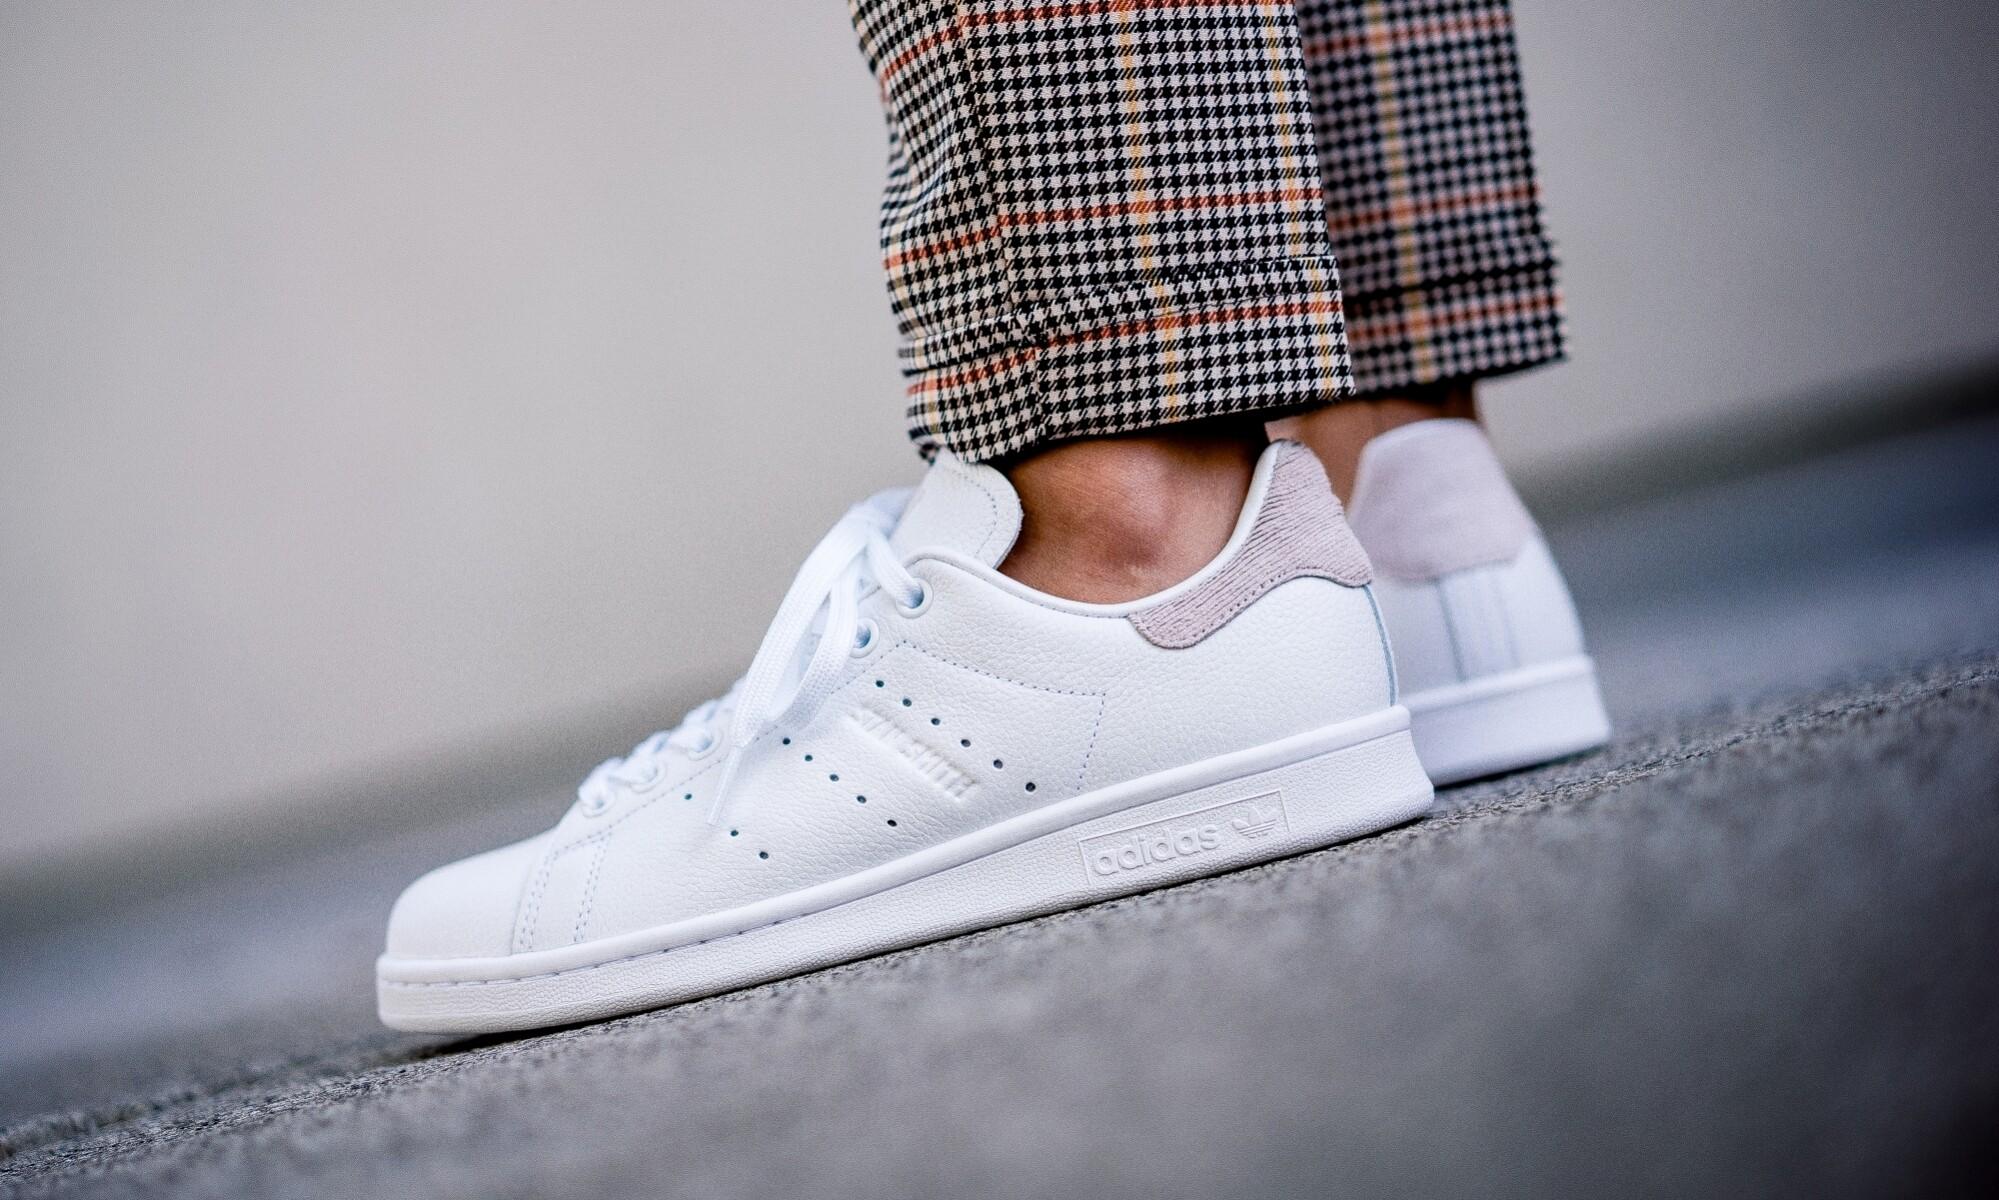 B41625 アディダススタンスミスランニングホワイト/adidas STAN SMITH running white